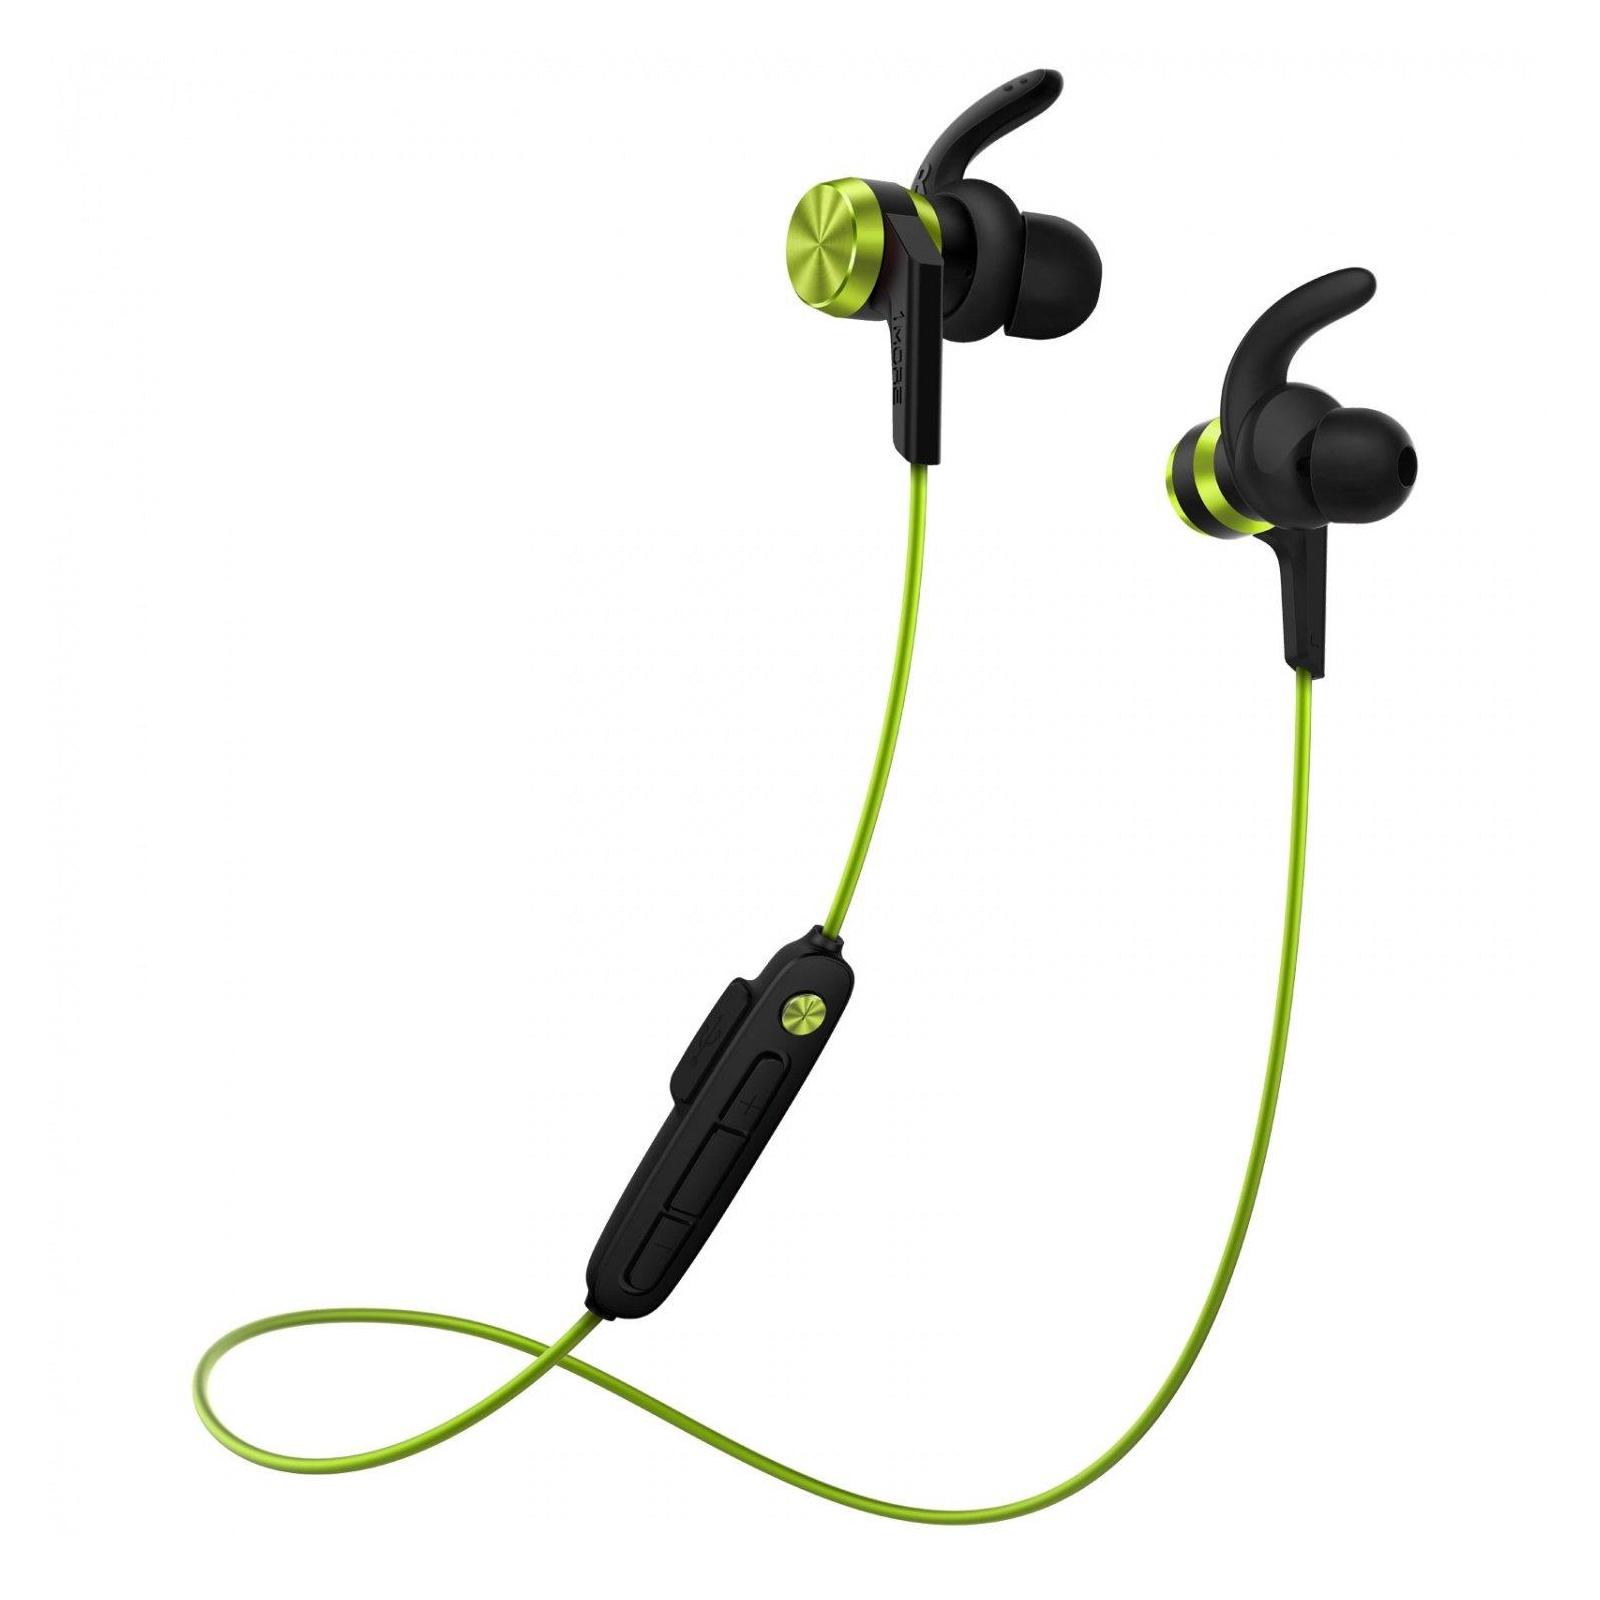 Навушники 1MORE iBFree Sport Green (E1018-GREEN) зображення 2